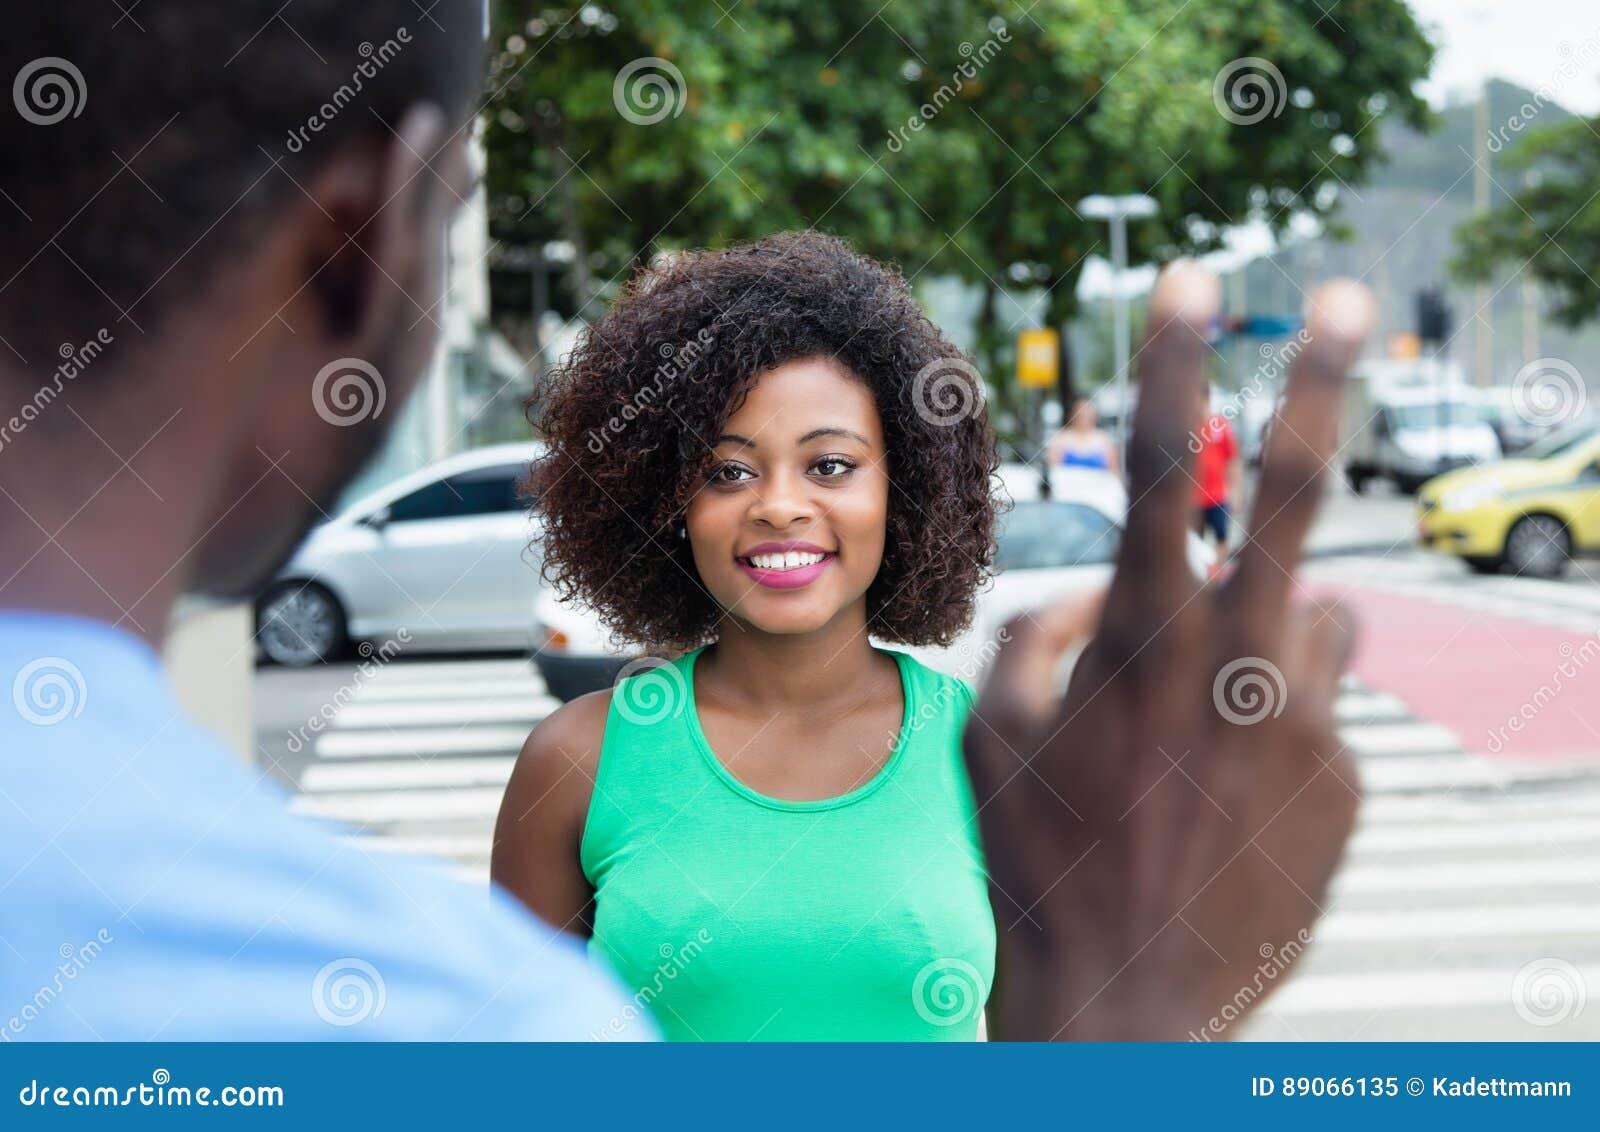 Rencontre africaine – Love 2 Toi